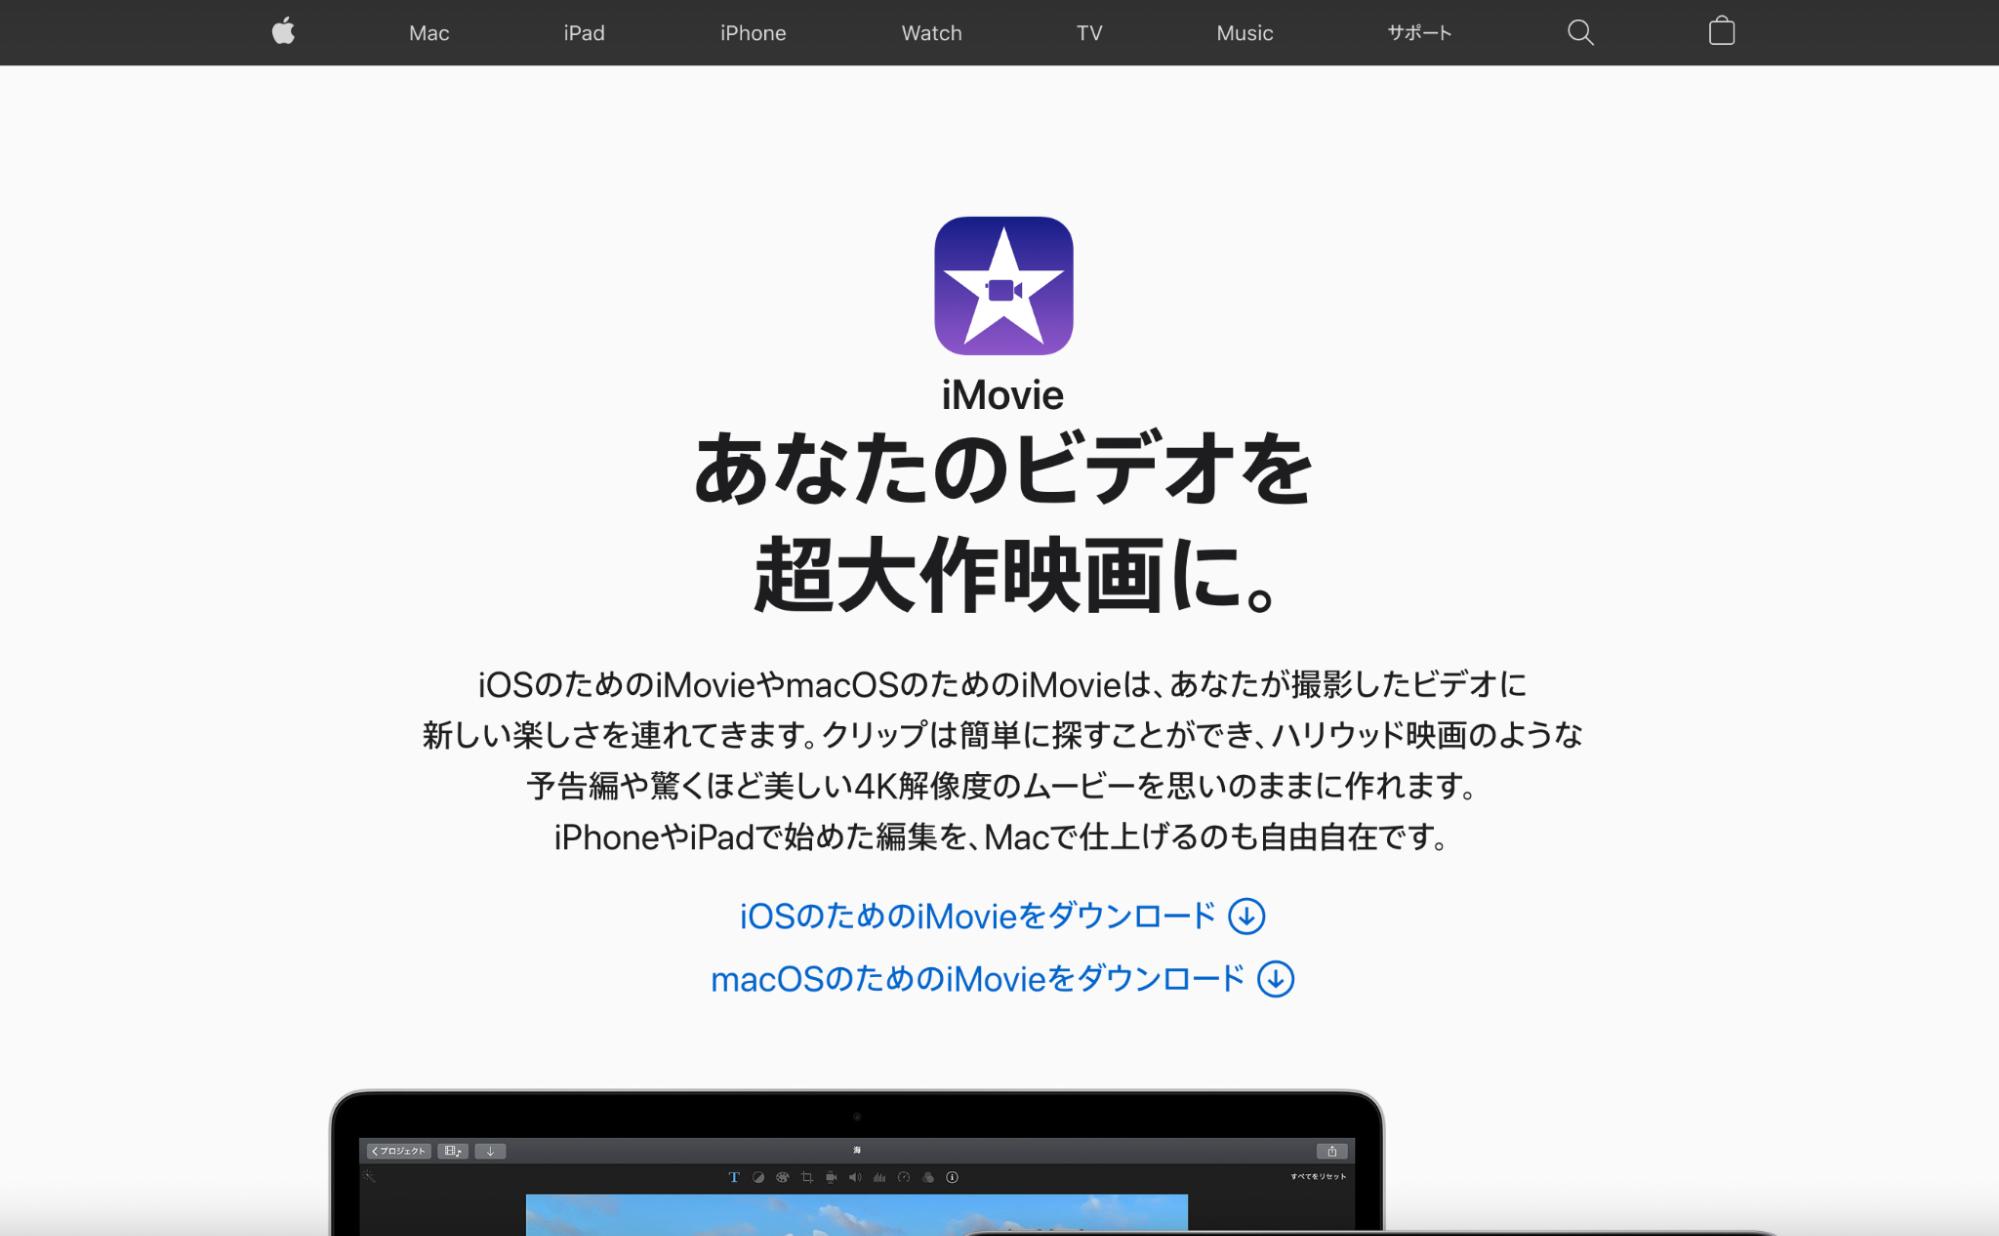 imovieのWebサイトトップ画面